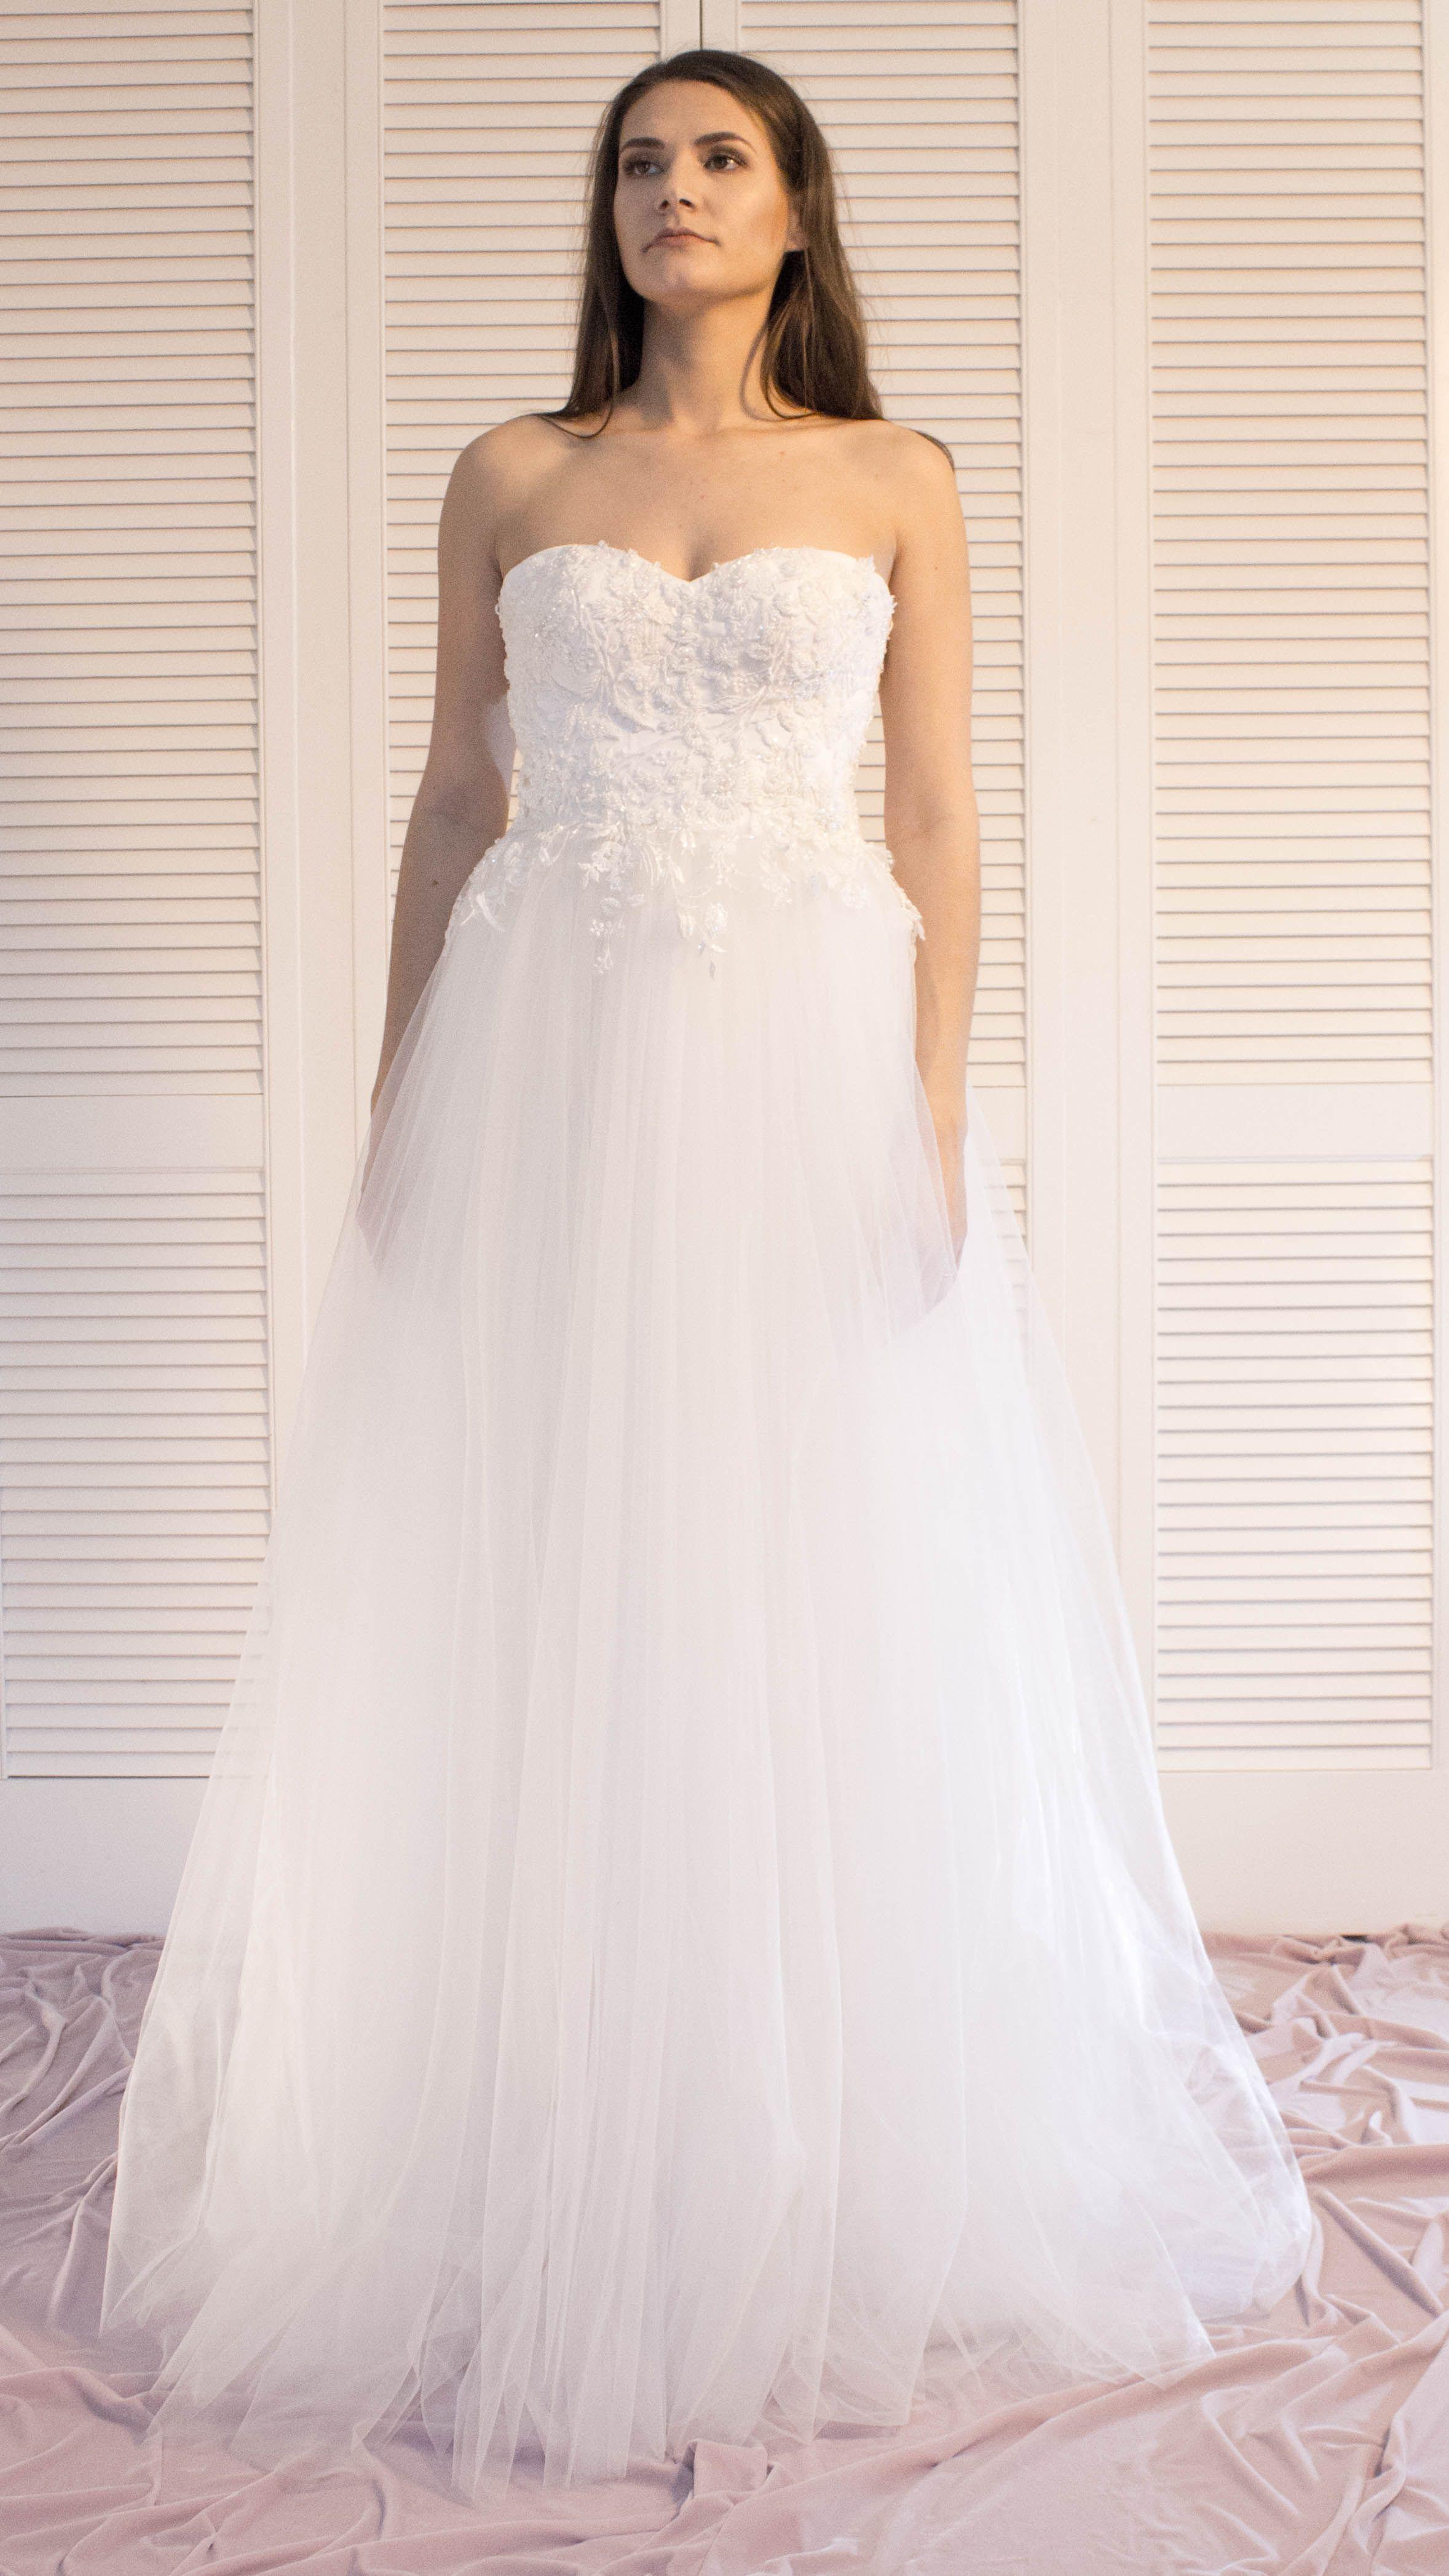 2019 Collection Wedding dresses, Belle wedding dresses